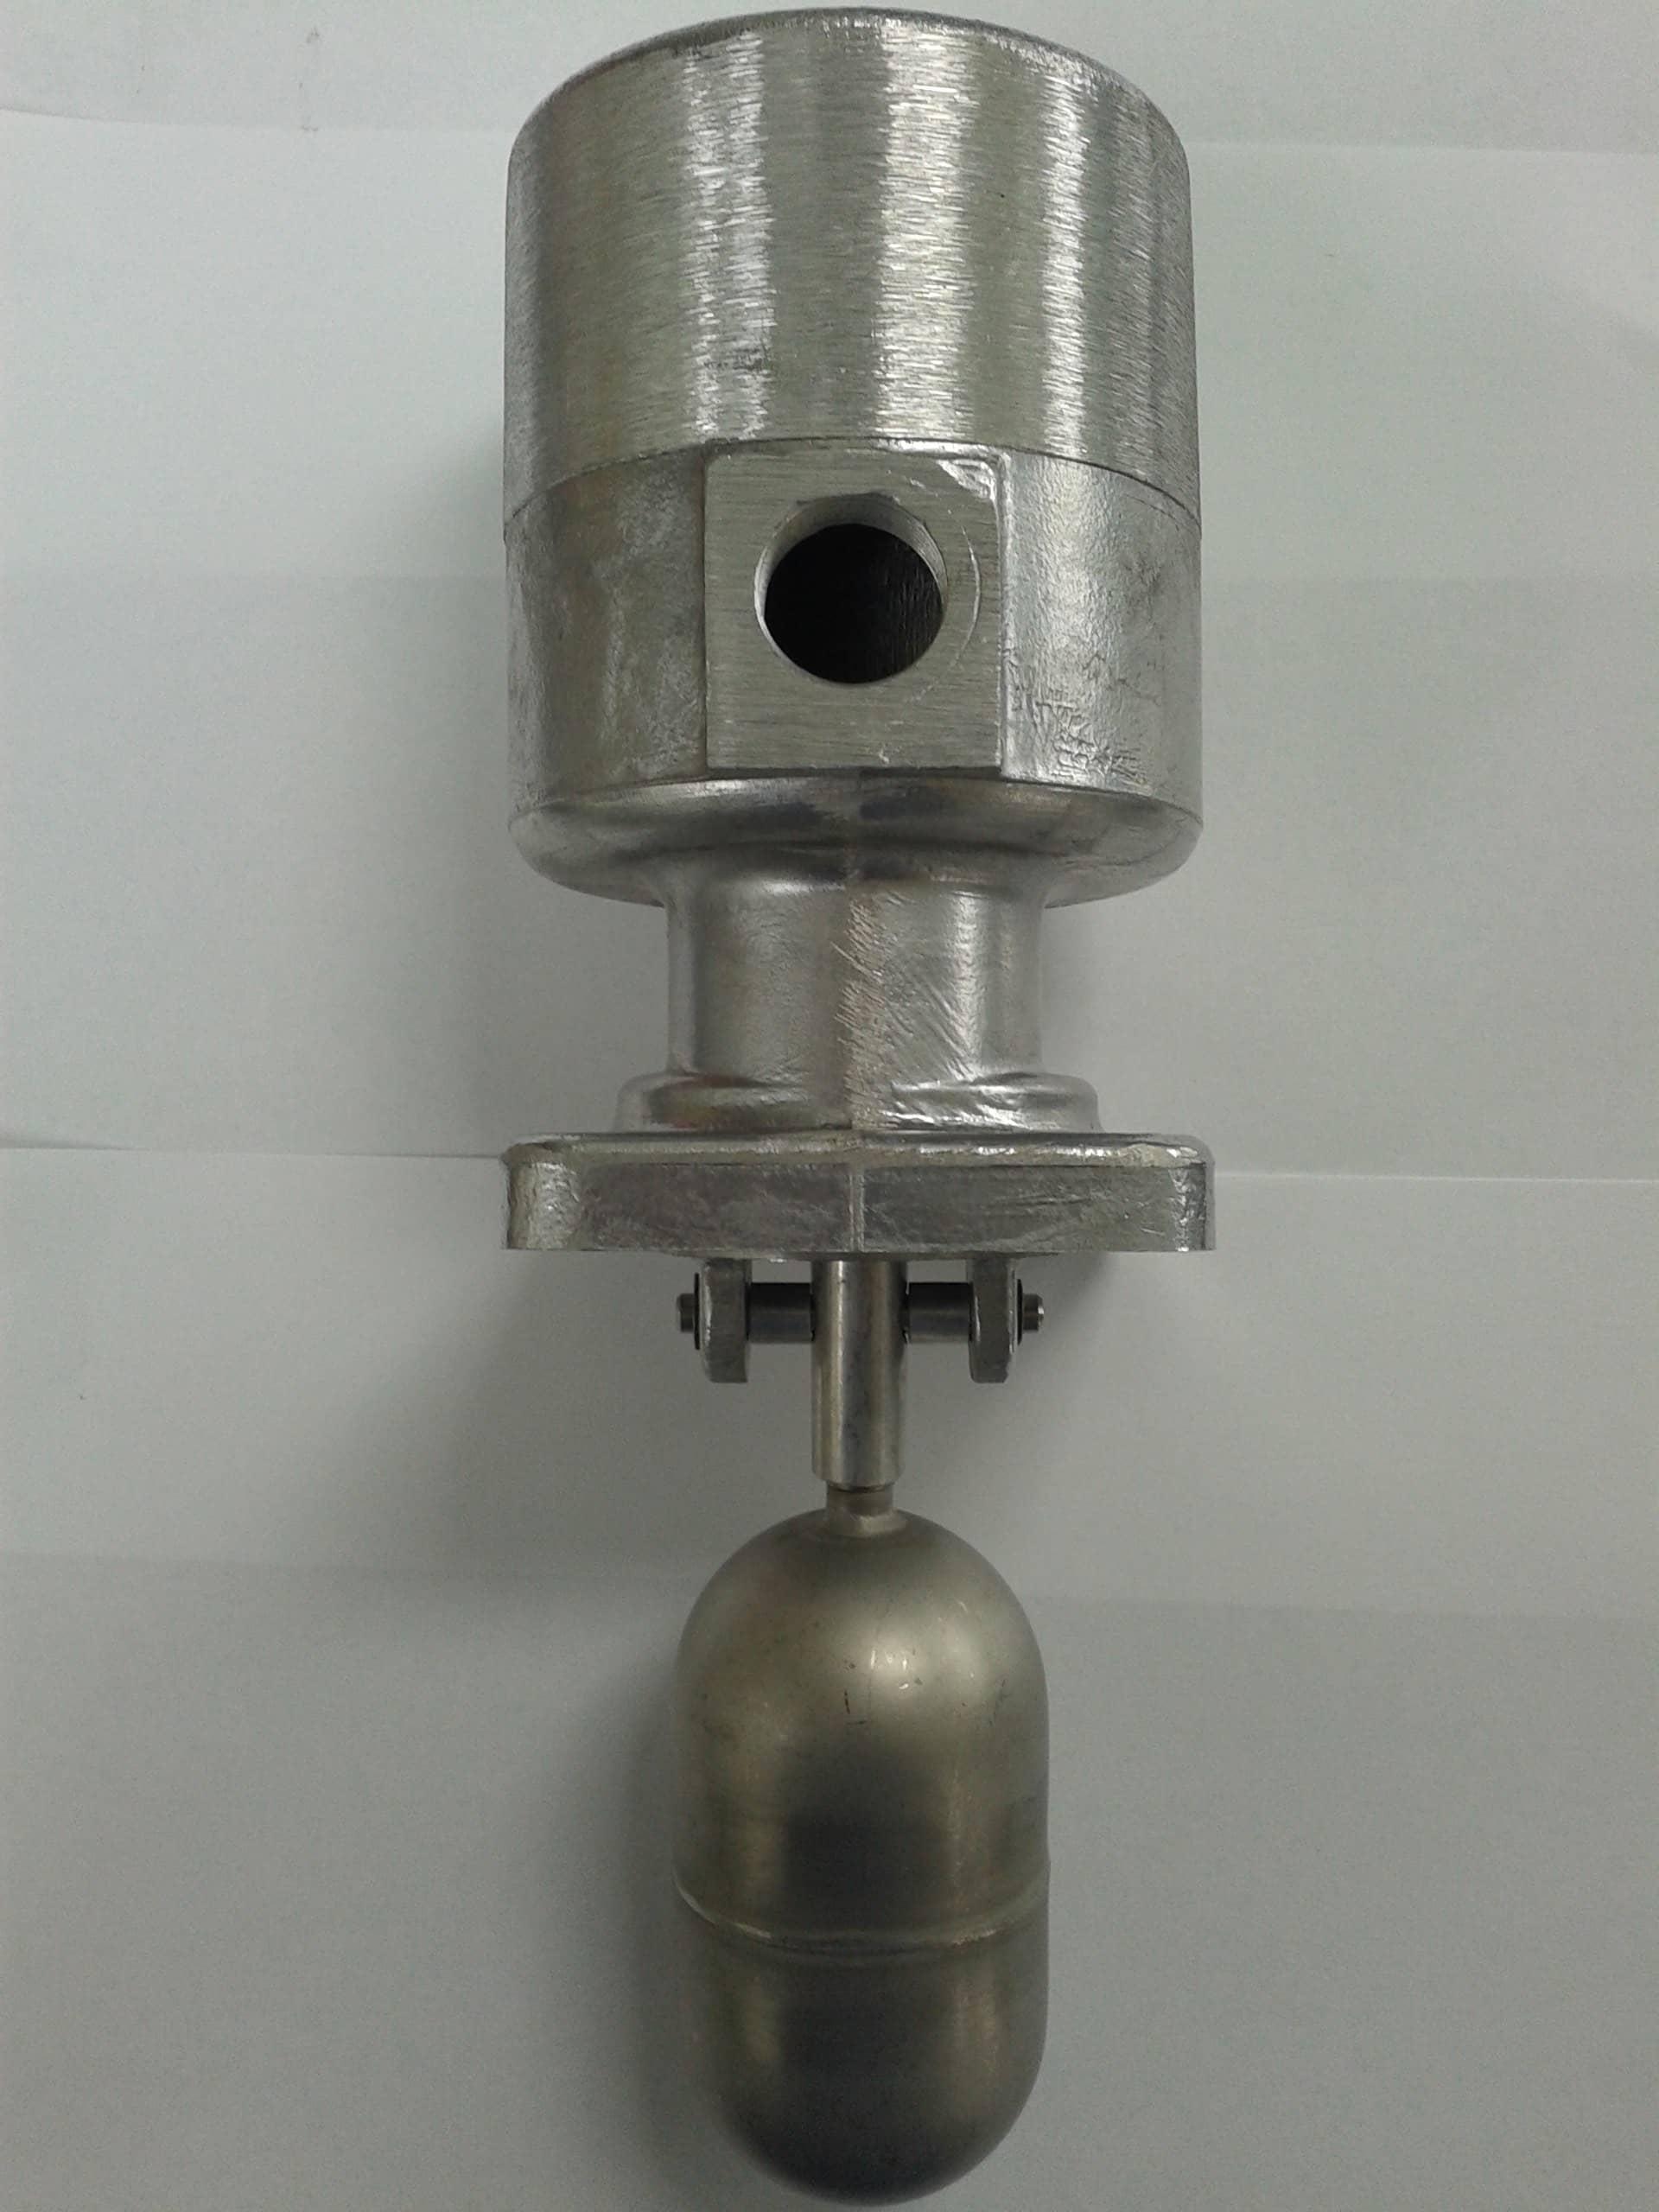 Bestobell Mobrey 2129 Magnetic Level Switch